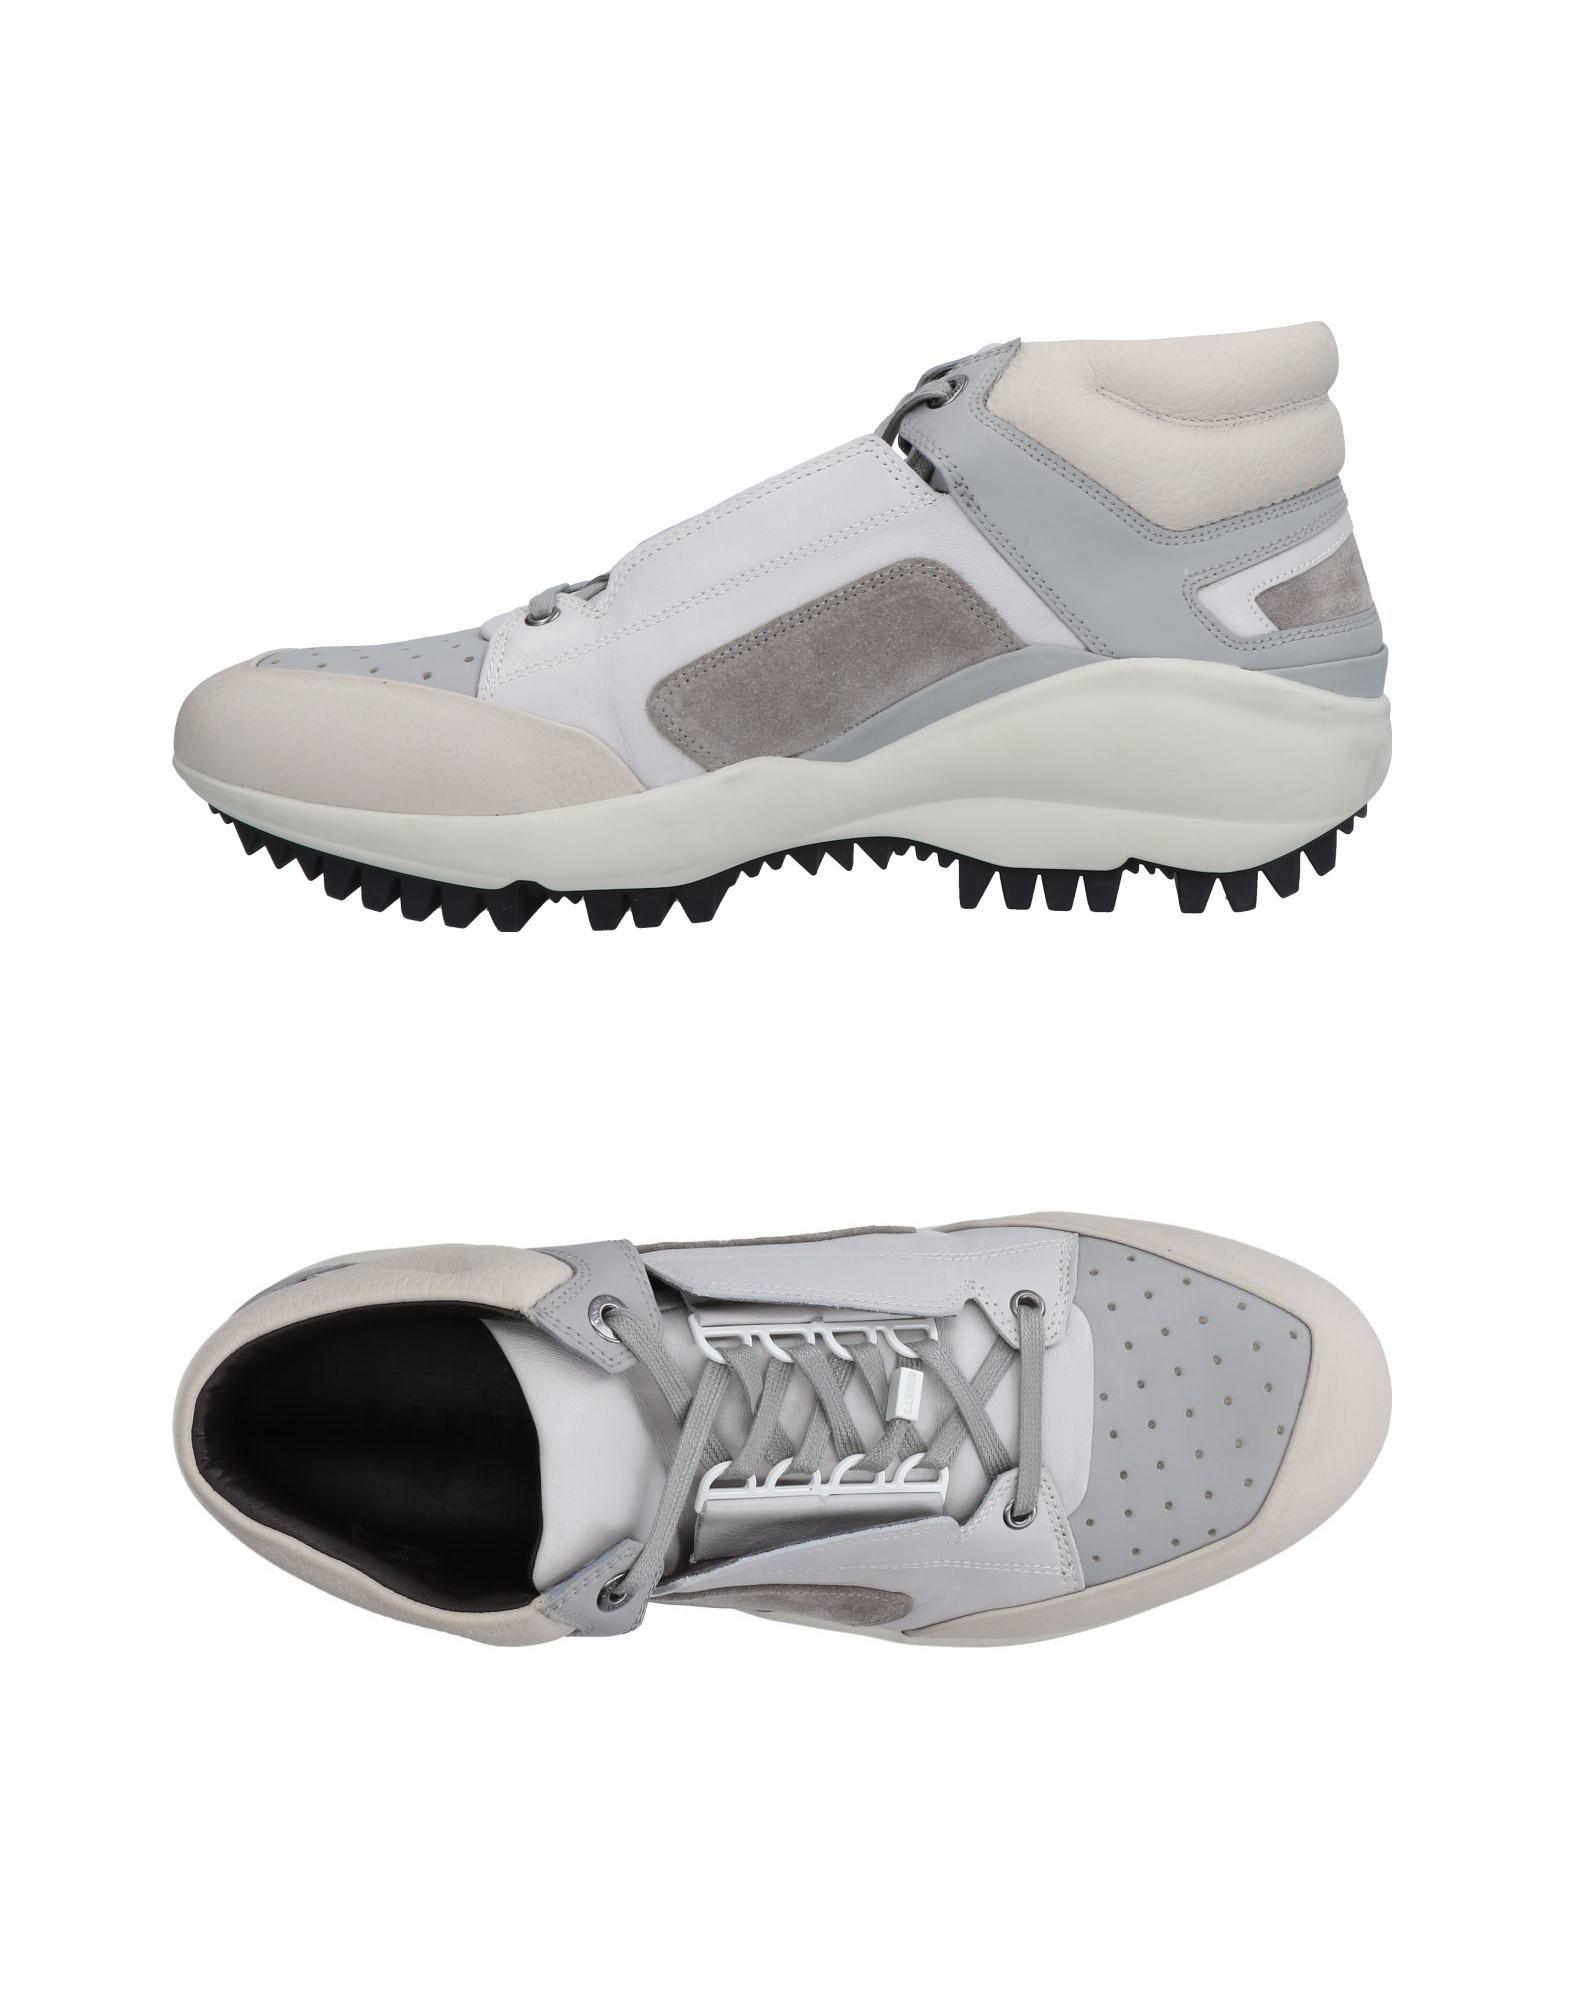 Lanvin Sneakers Herren  11512062CC Gute Qualität beliebte Schuhe